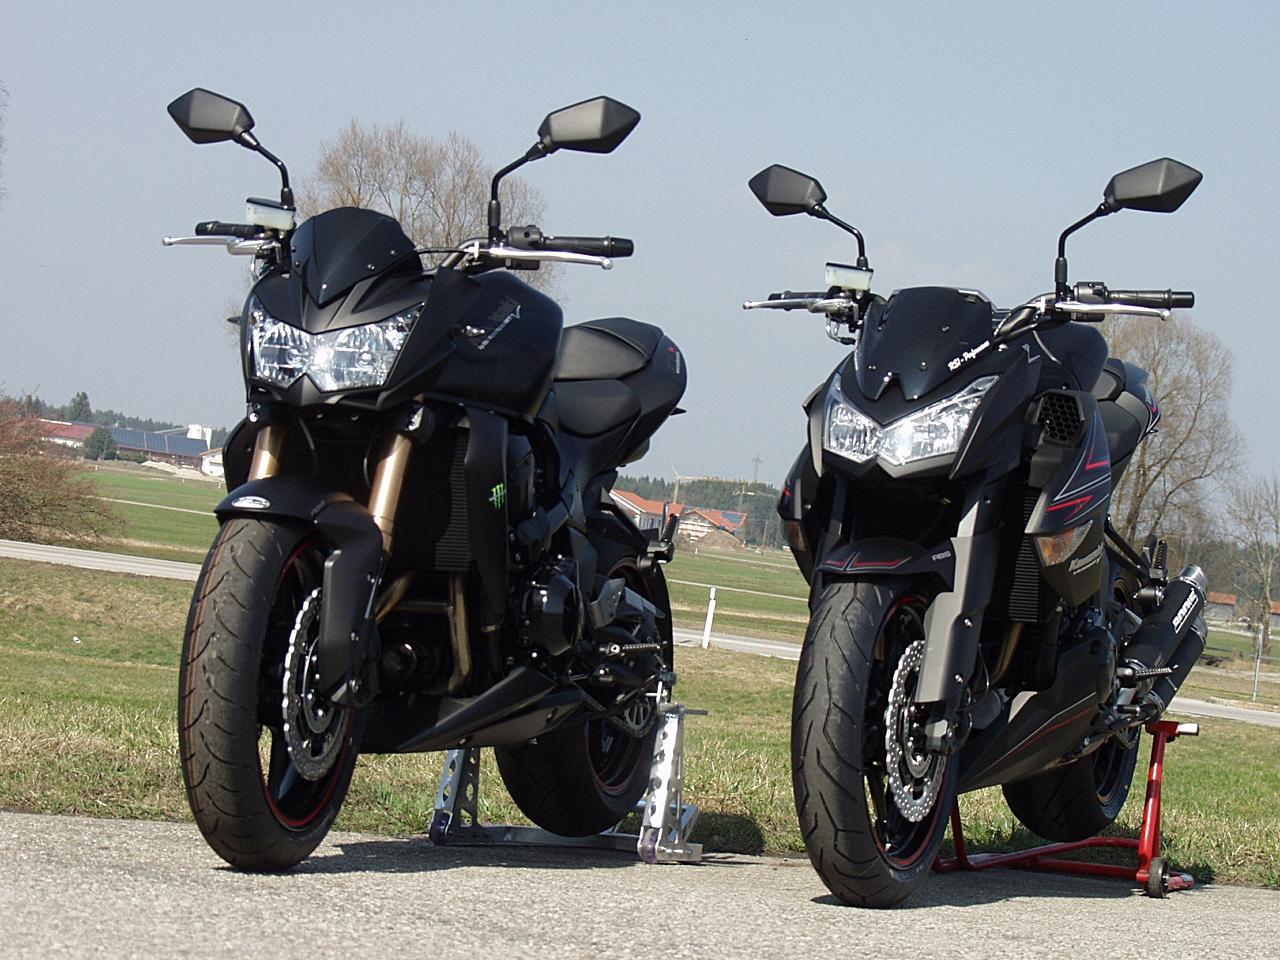 Motorrad Bild Z750R ABS 2012 RSI Bodis Flat Black Edition